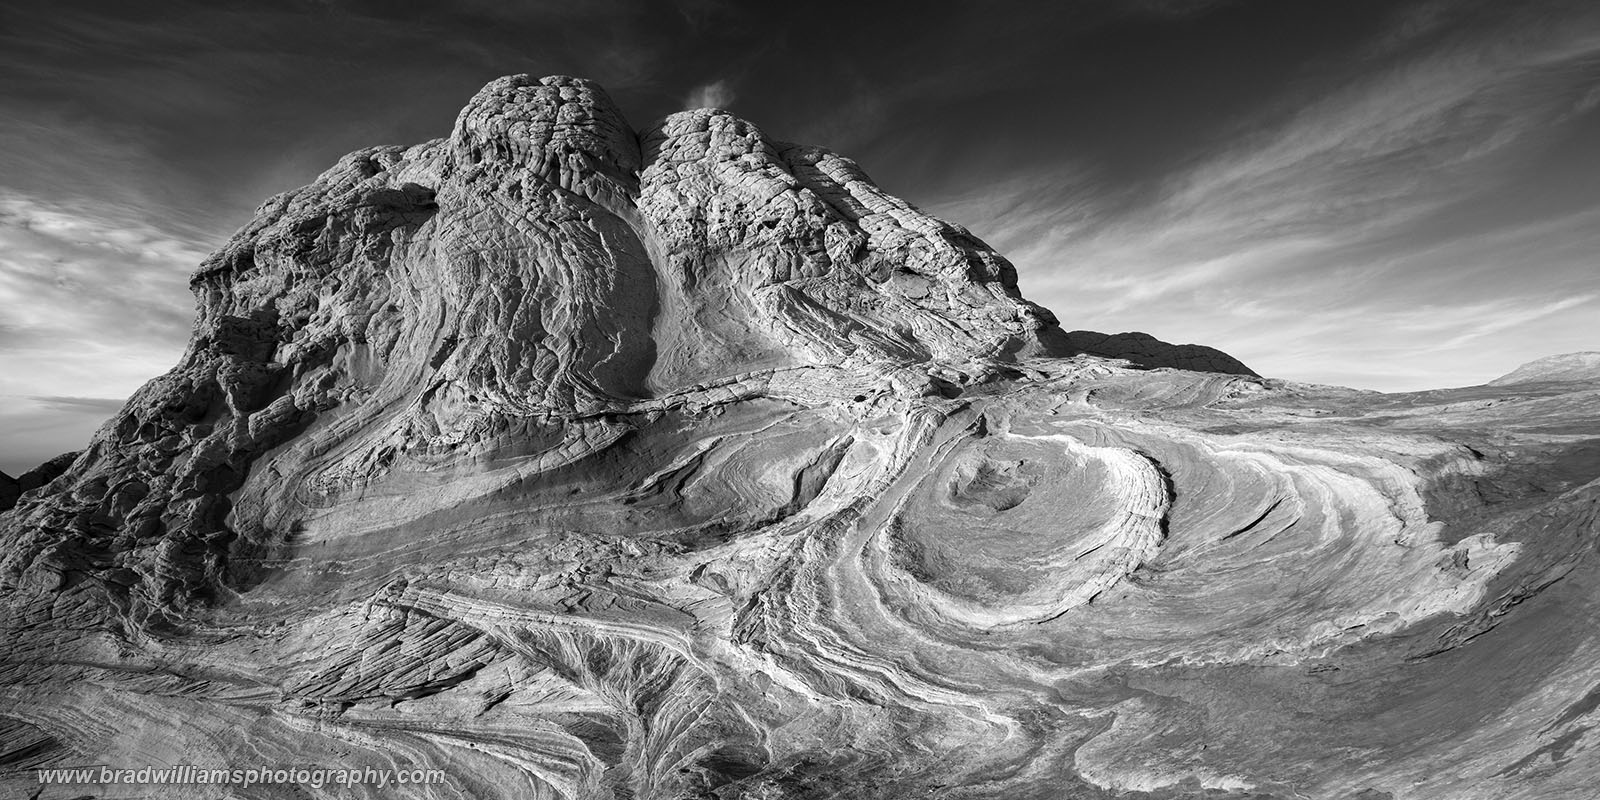 White Pocket, Vermilion Cliffs, Arizona, photo